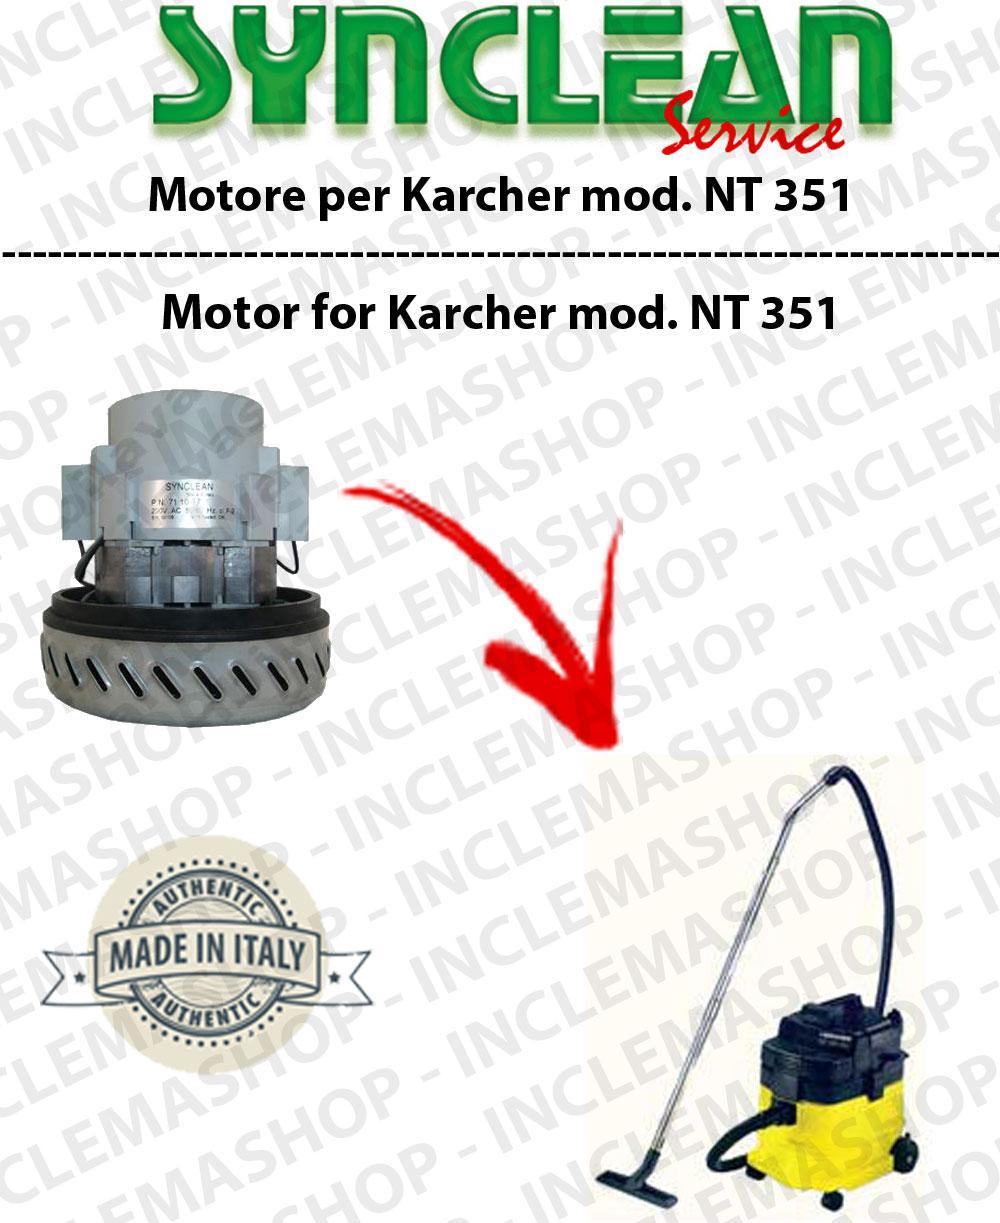 2801 VACUUM MOTOR AMETEK for vacuum cleaner KARCHER